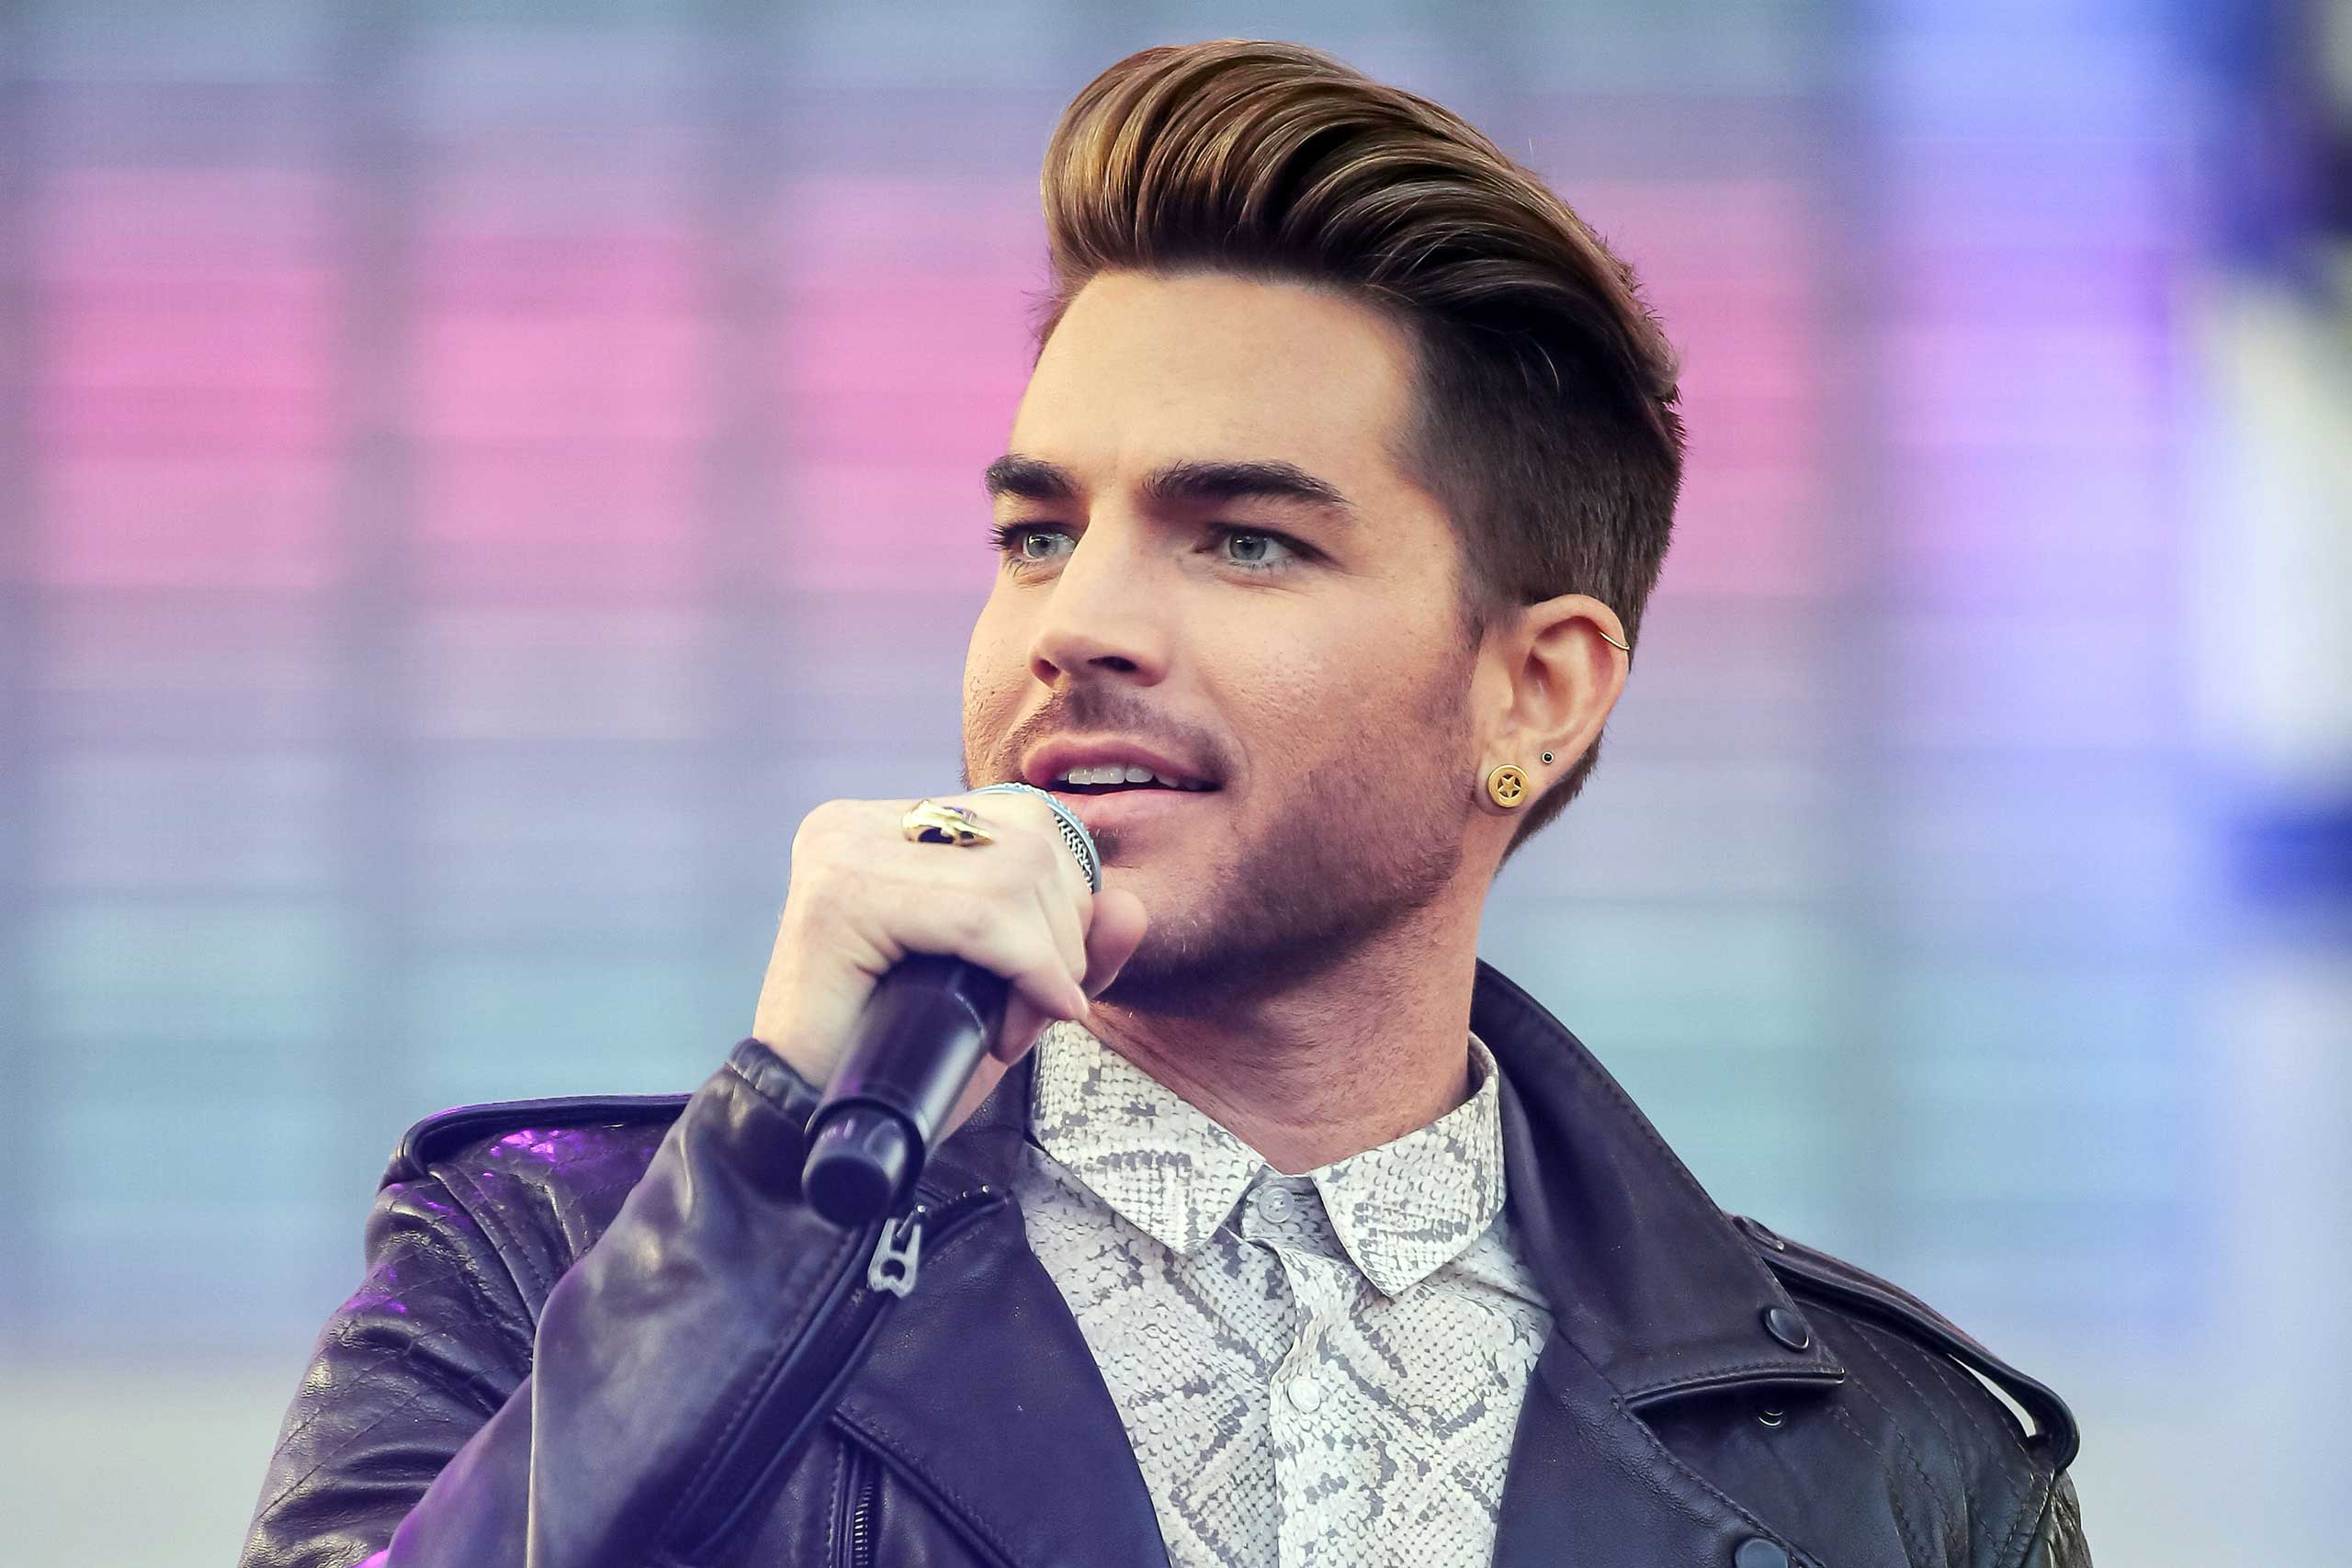 <b>Adam Lambert</b>, season 8 runner-up, is seen onstage at 102.7 KIIS FM's Wango Tango at StubHub Center in Los Angeles on May 9, 2015.